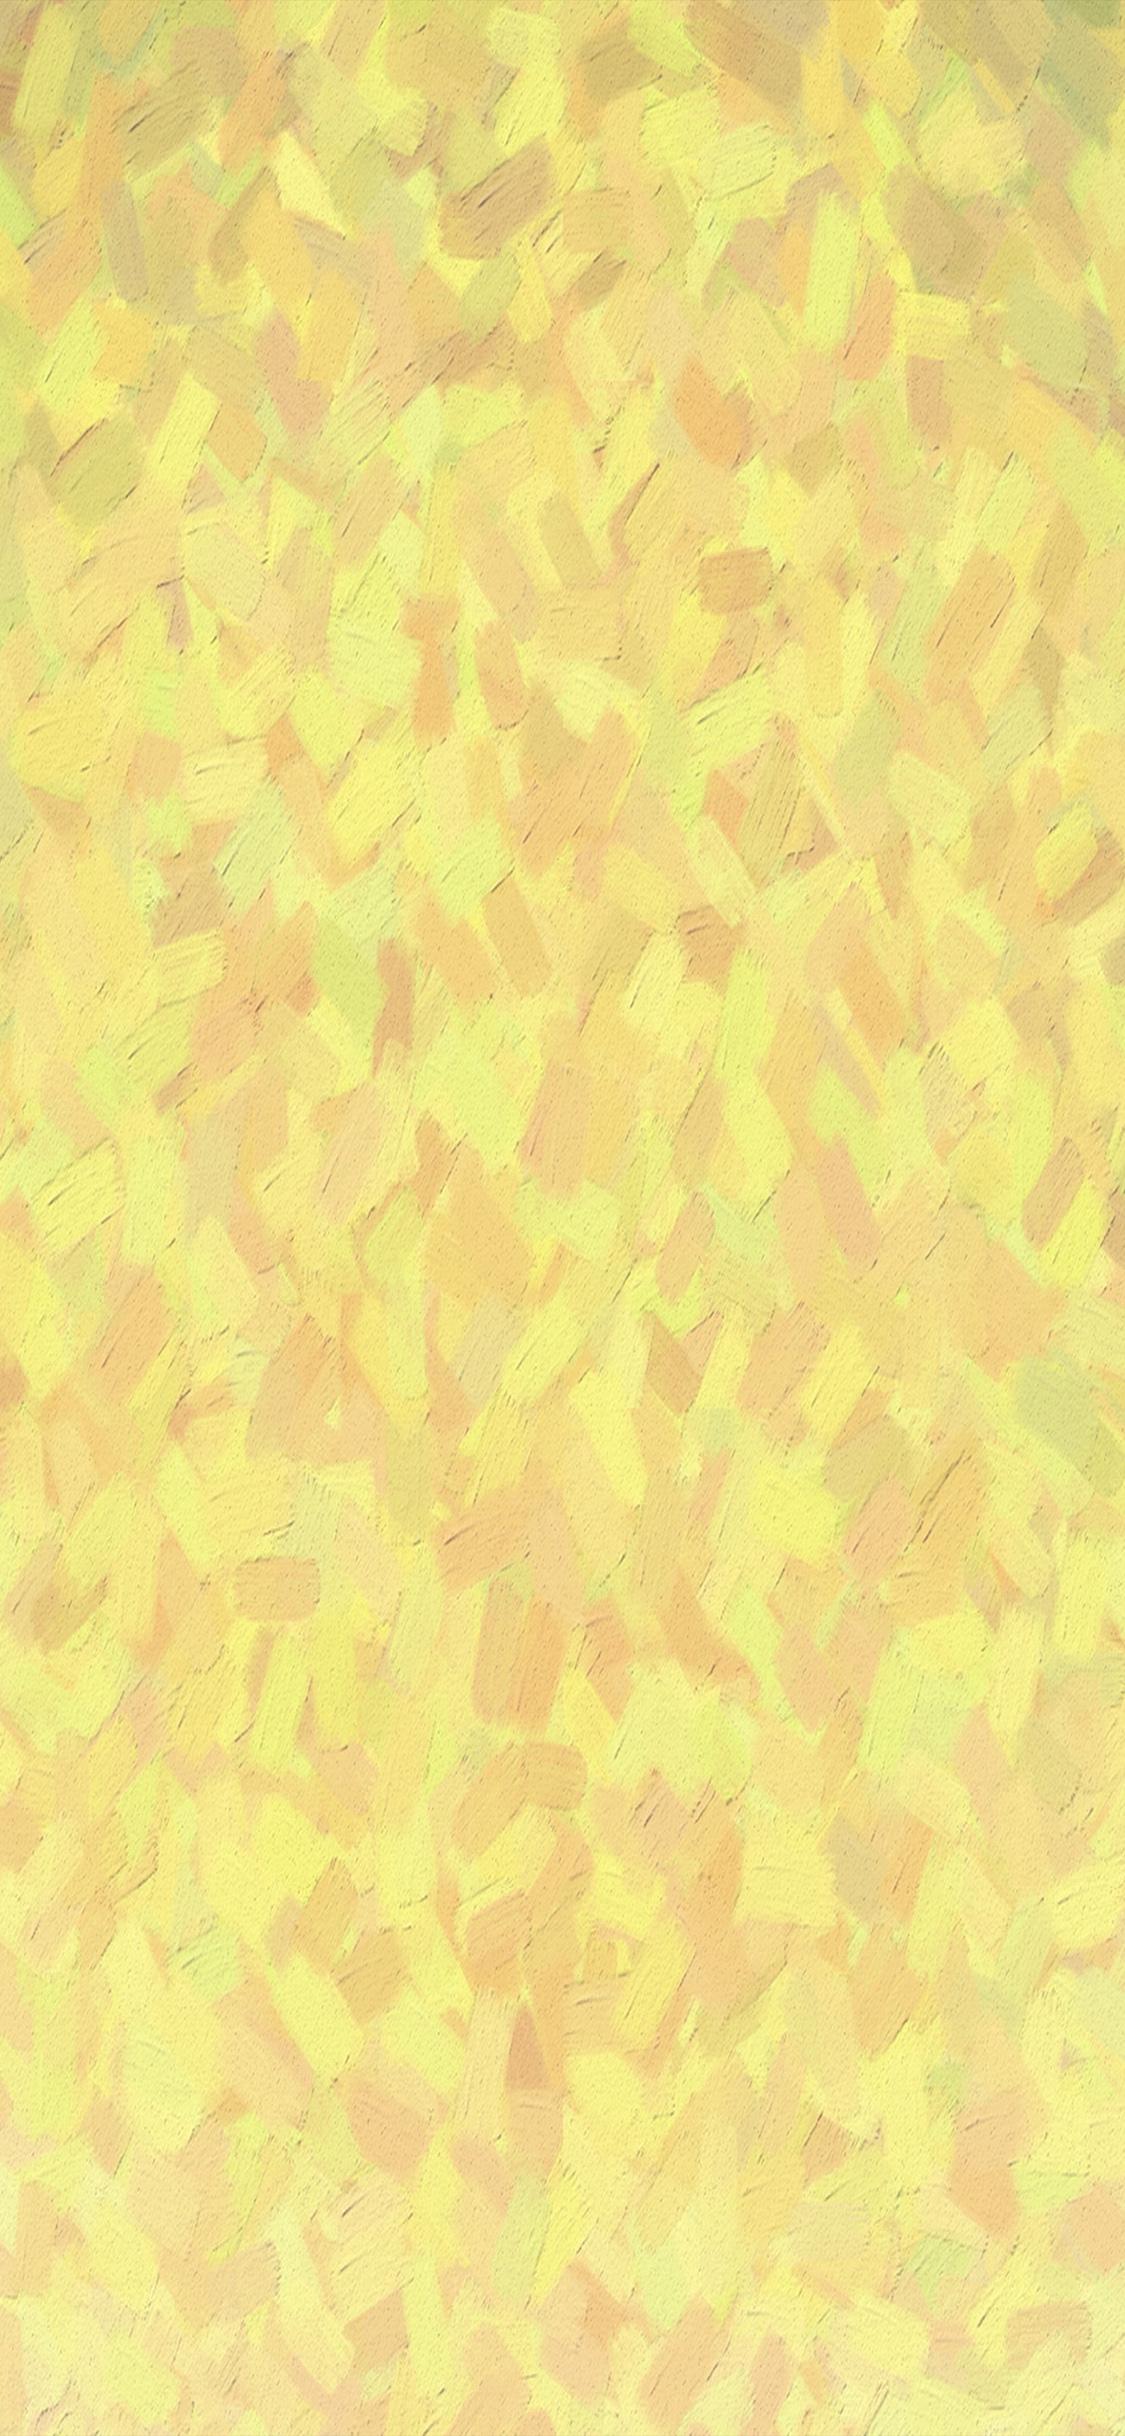 iPhonexpapers.com-Apple-iPhone-wallpaper-vt98-paint-art-yellow-ocean-pattern